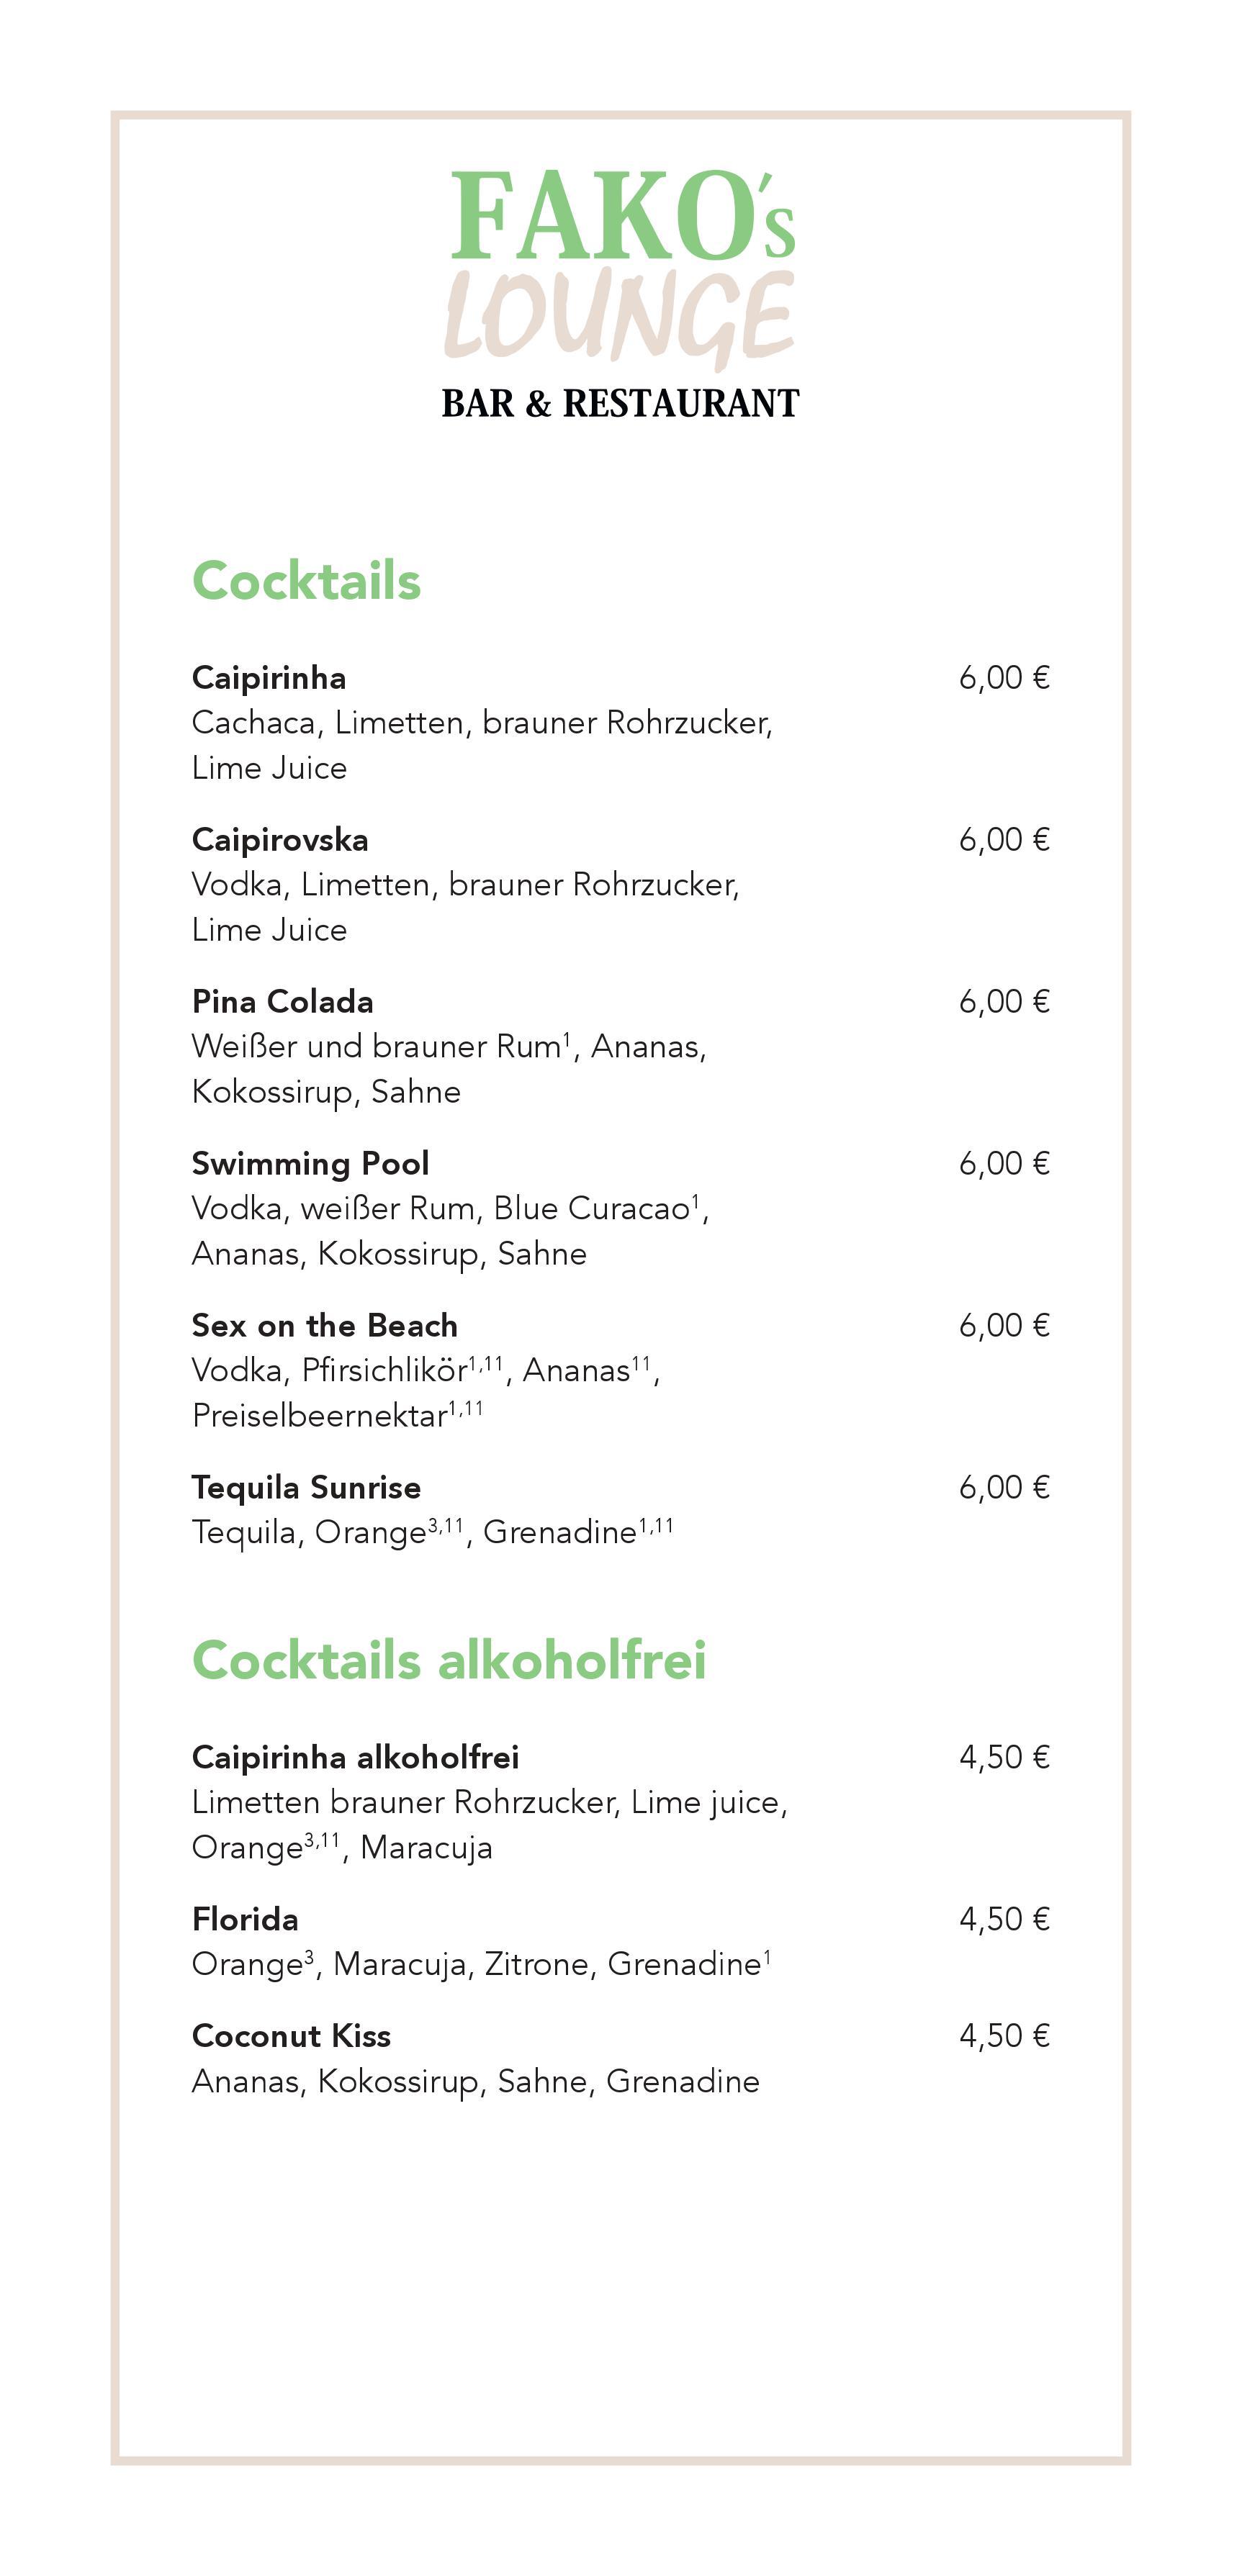 Spirituosen & Cocktails | Fakos Lounge